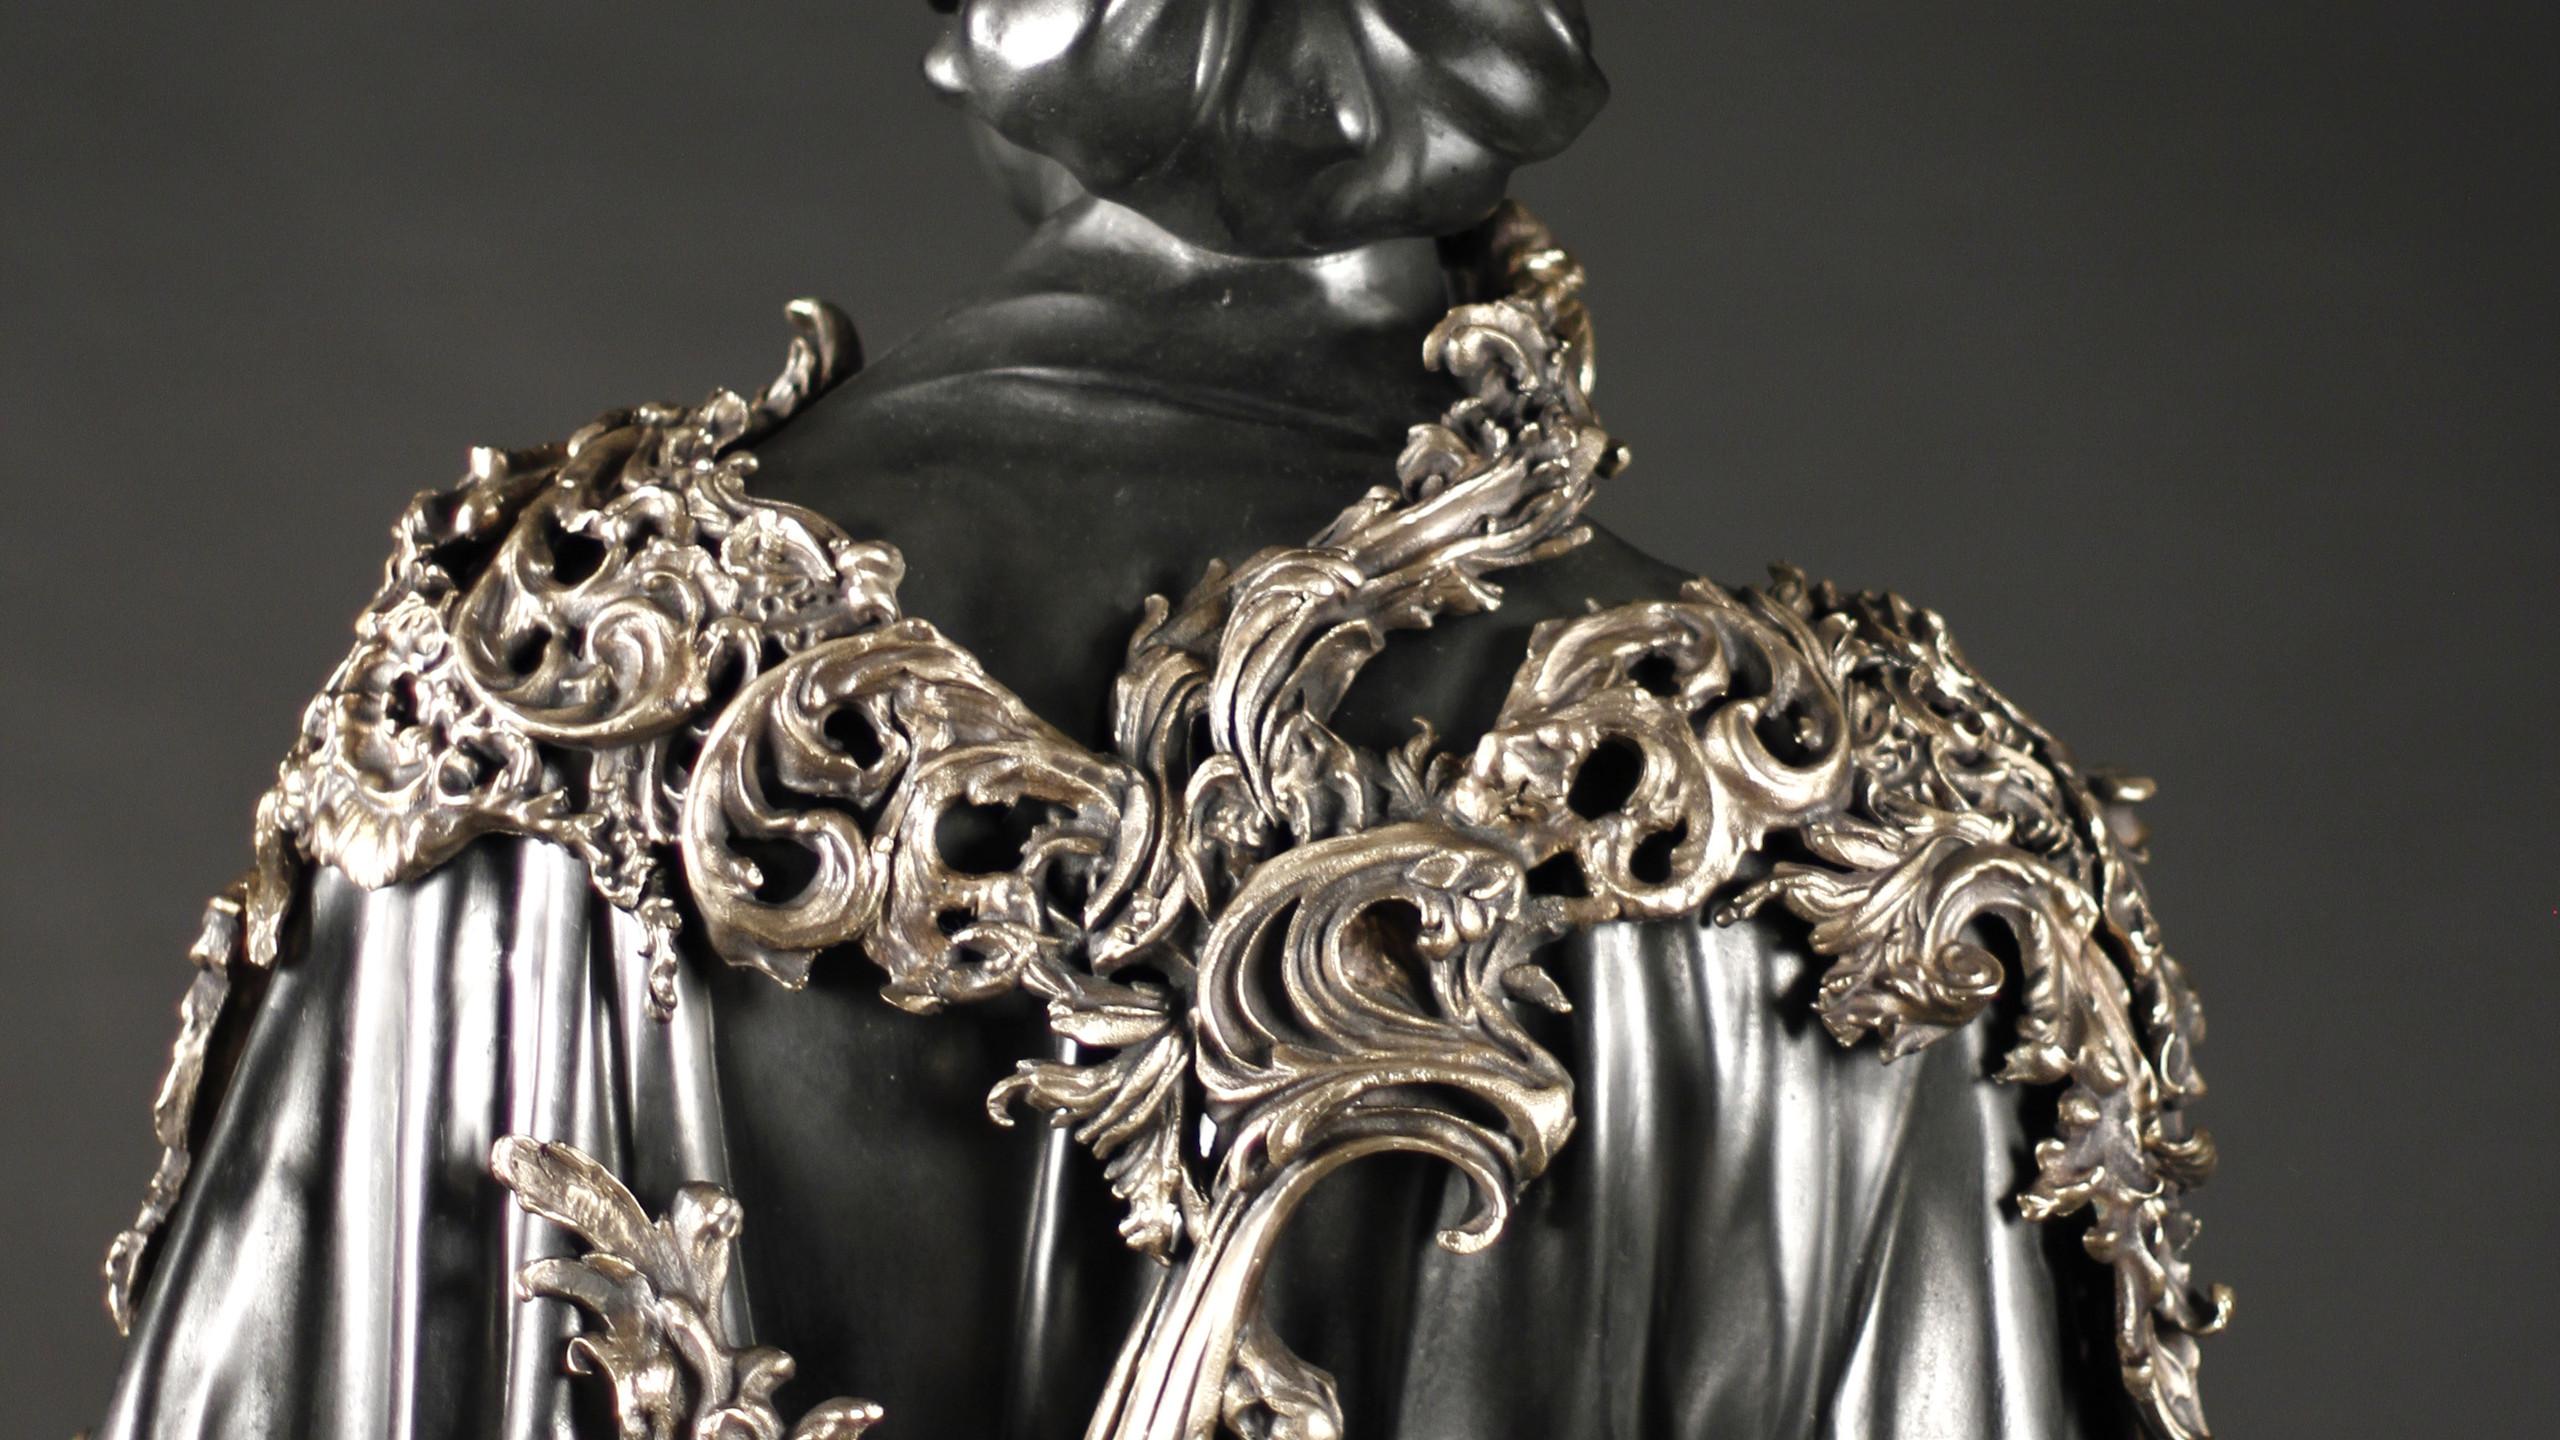 Rococo style relief bronze casting